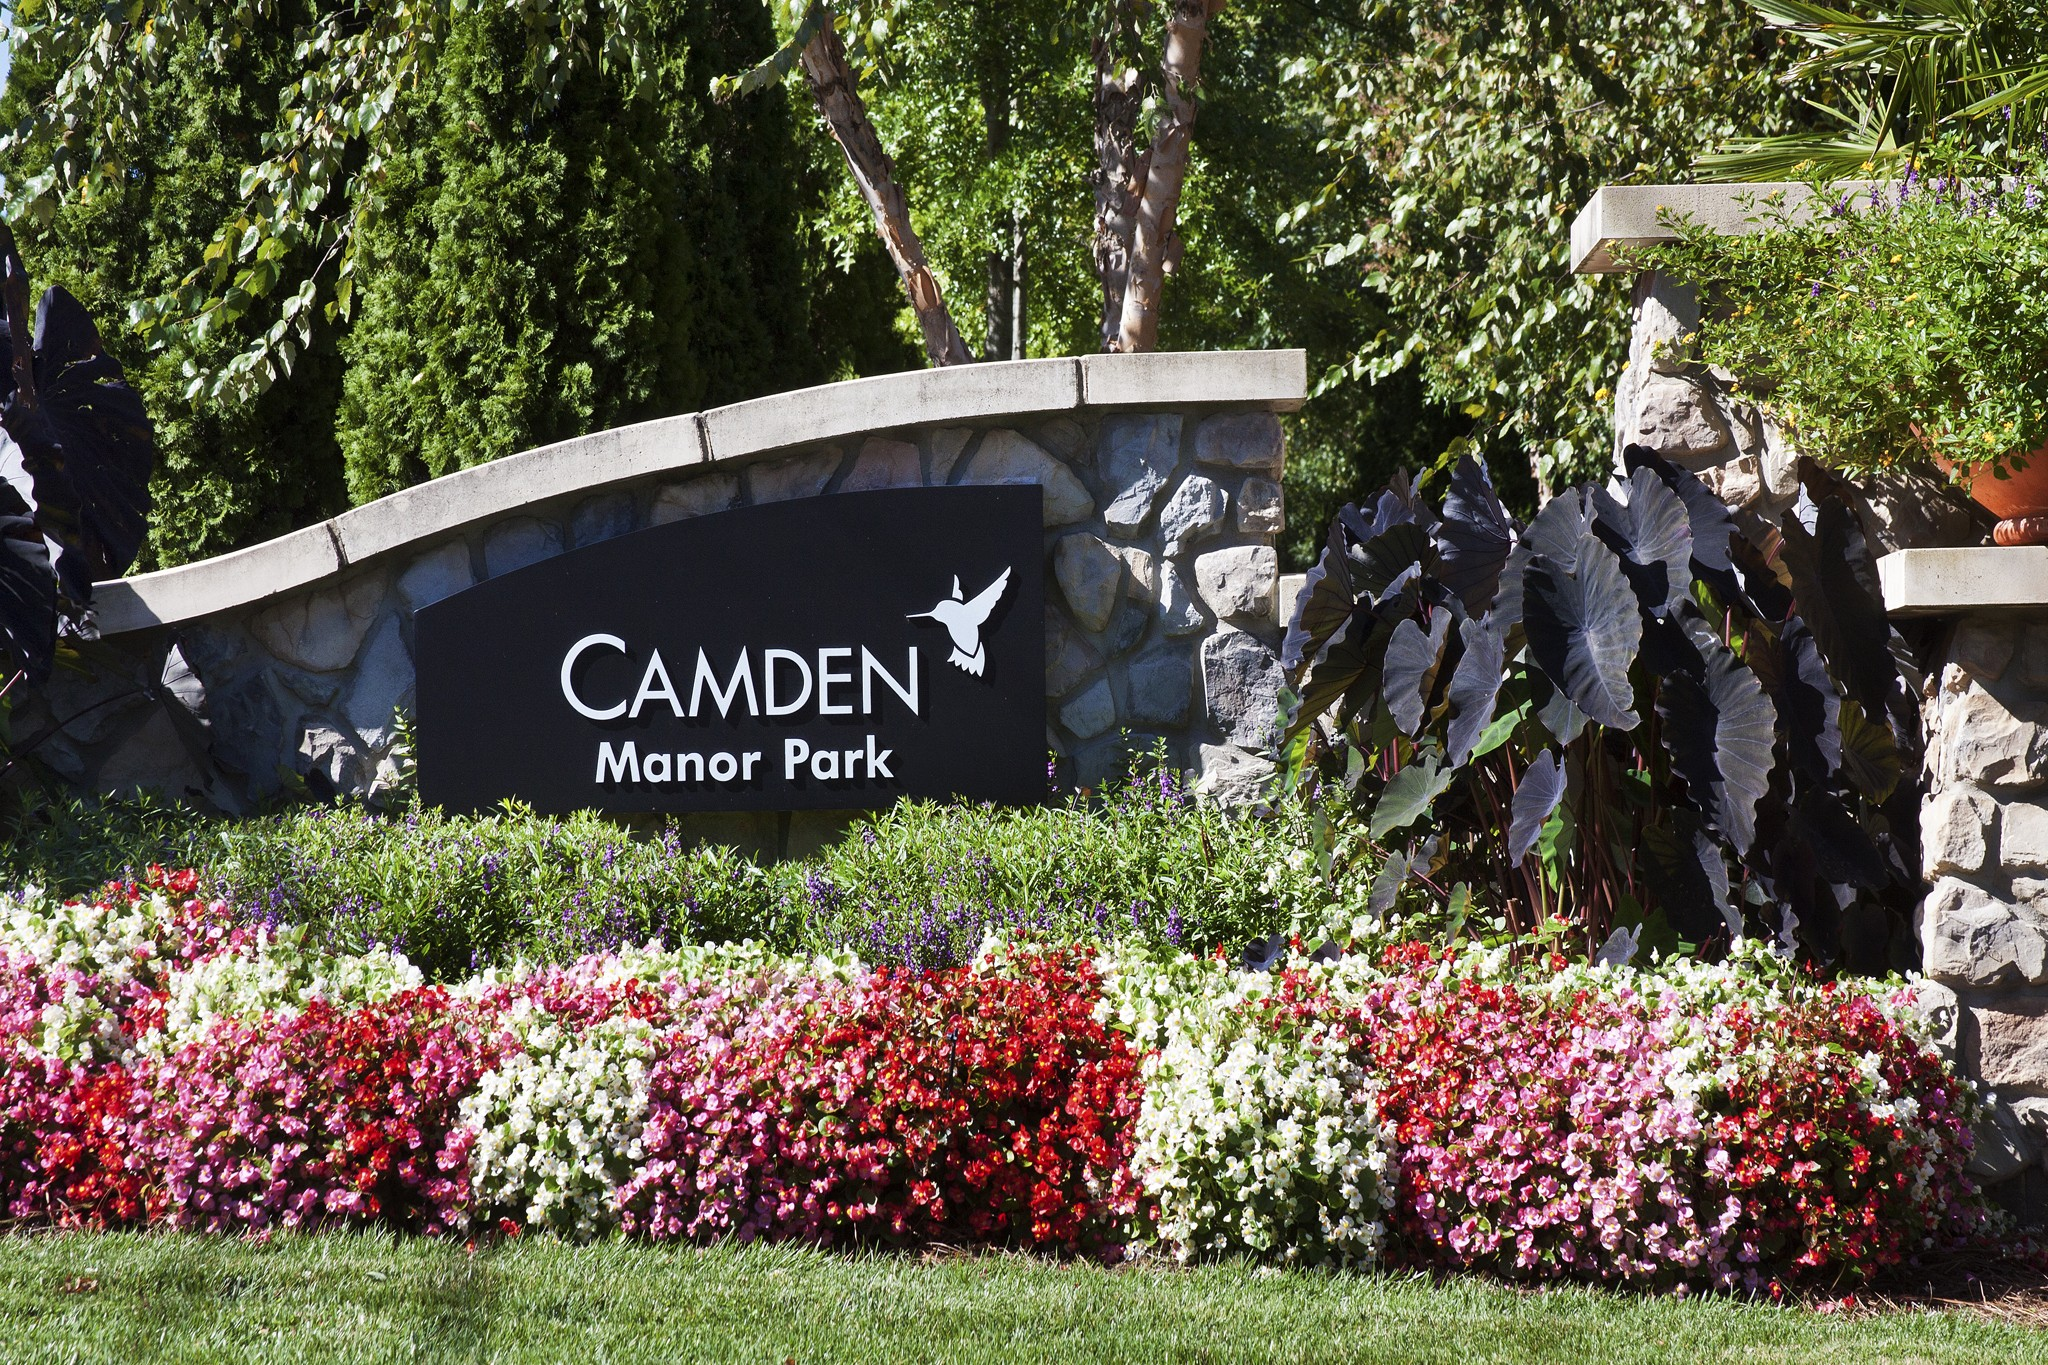 Camden Manor Park